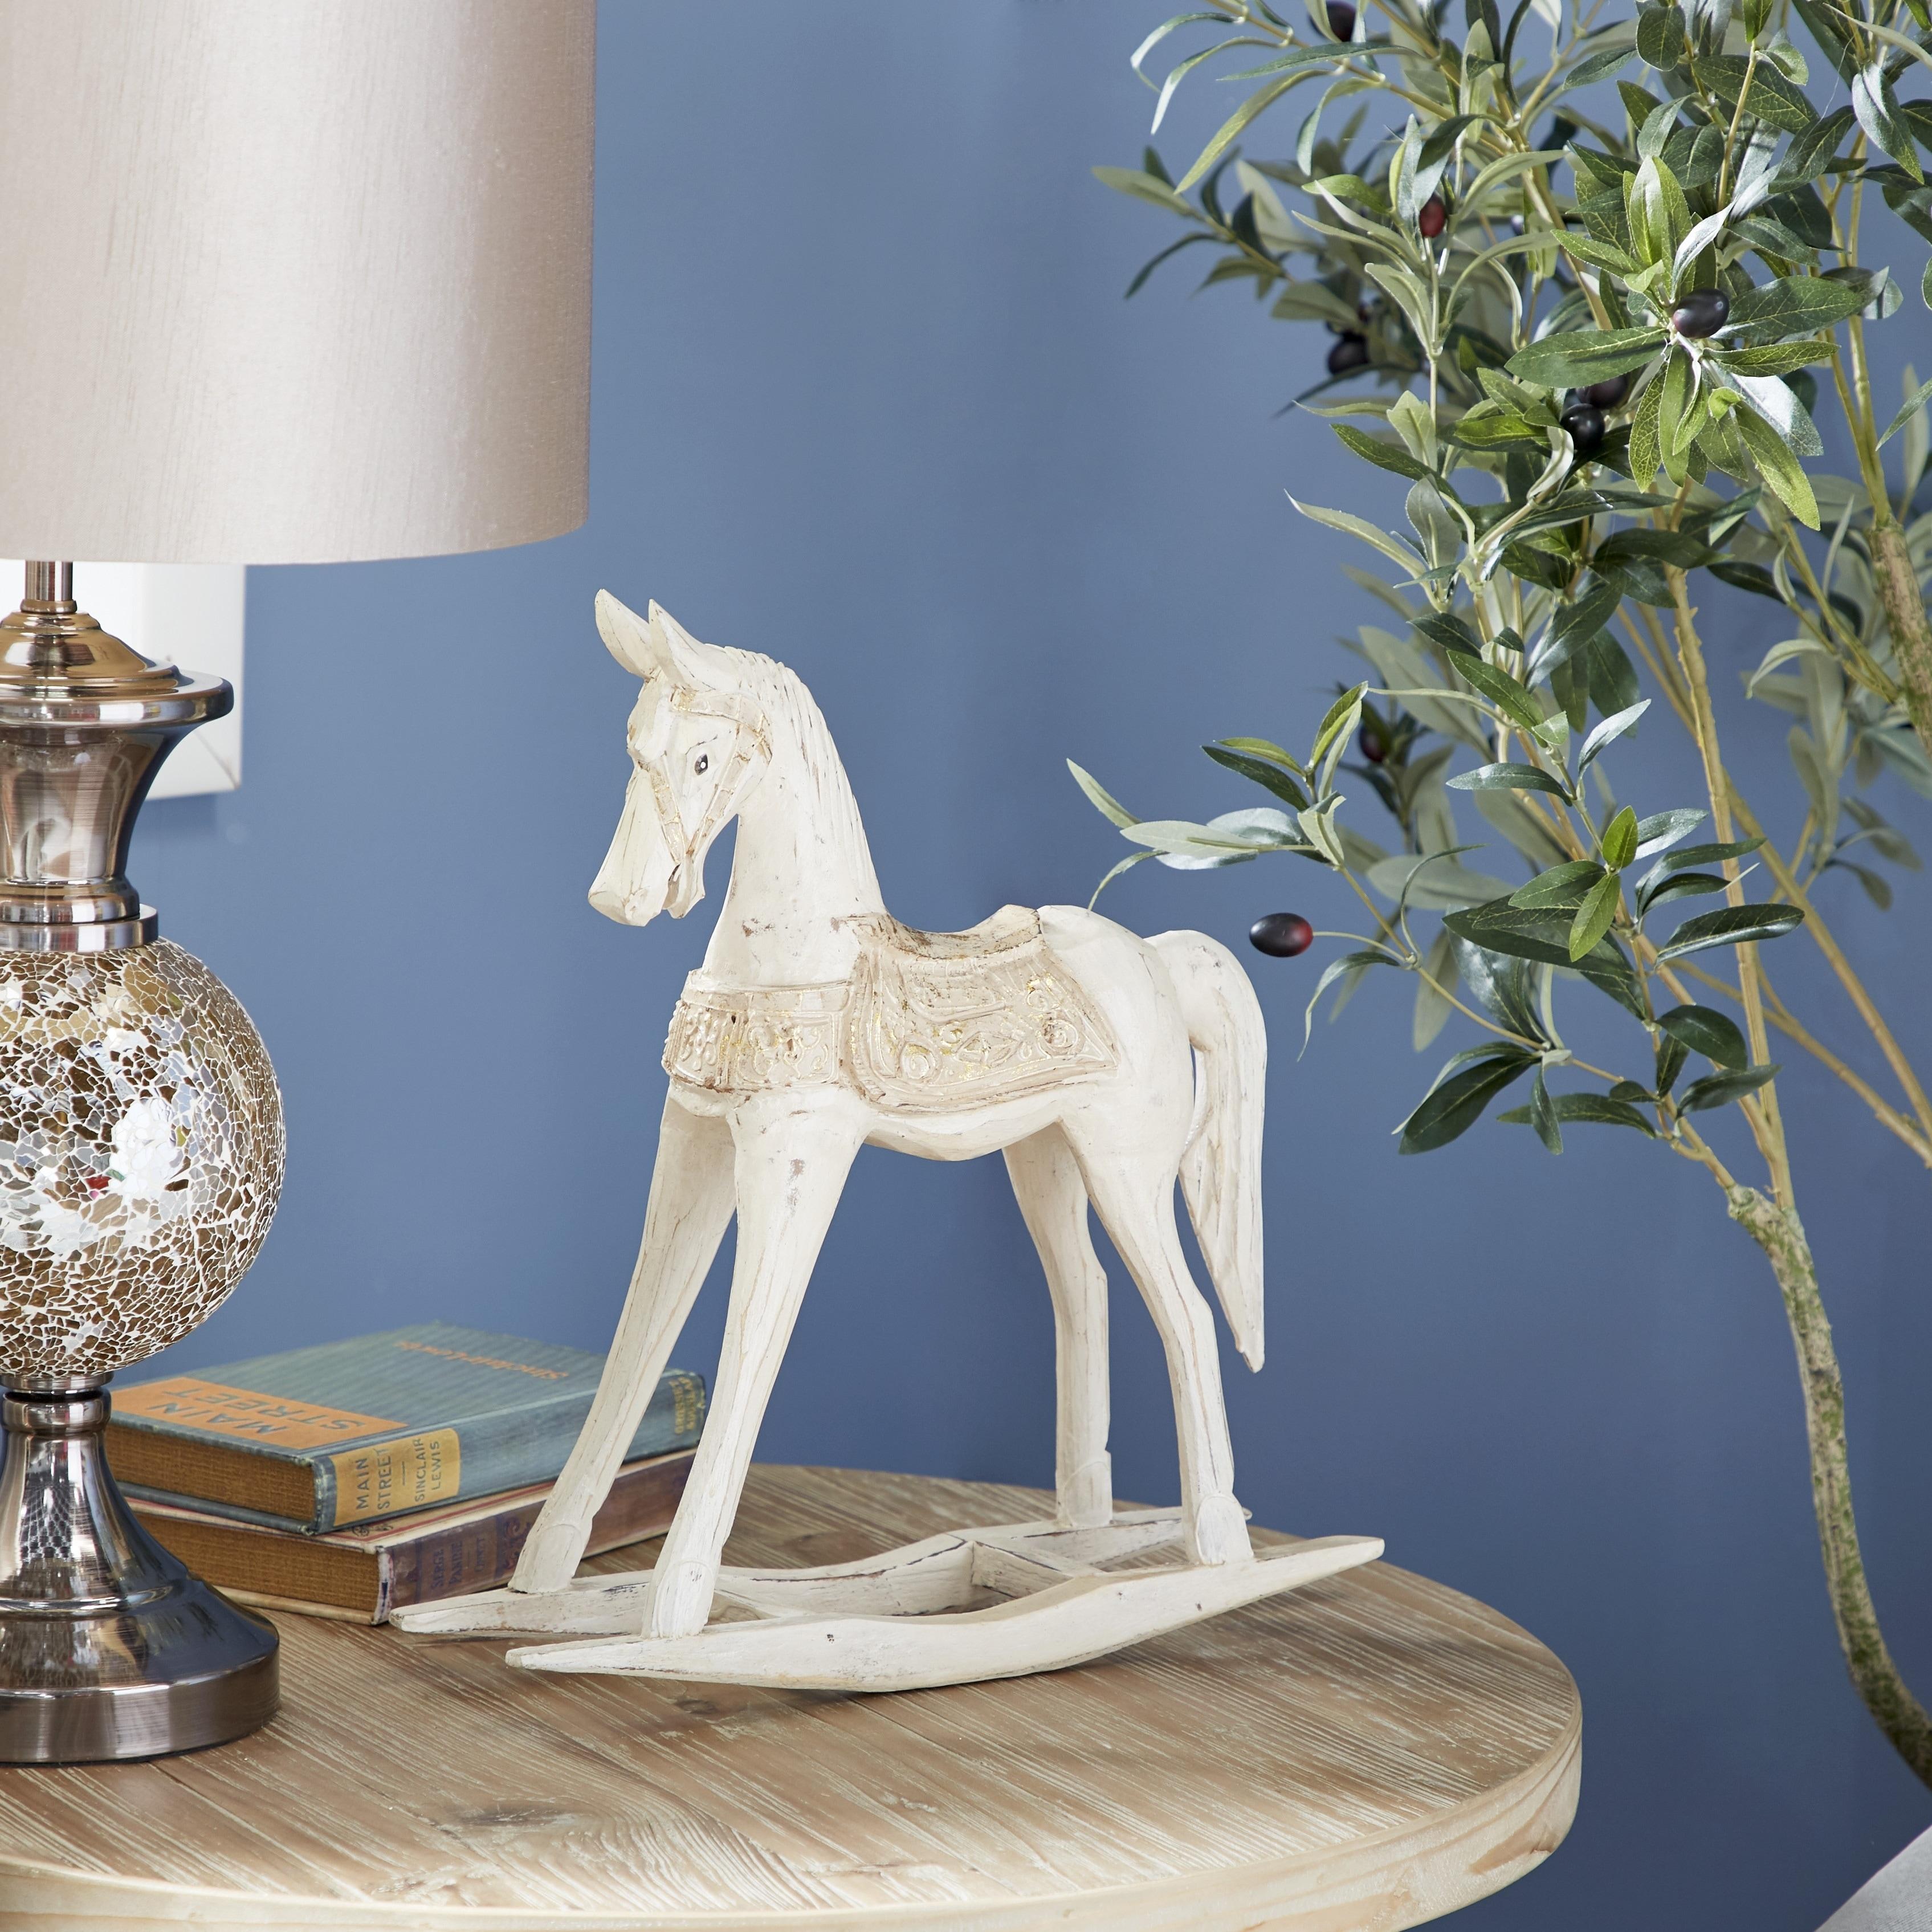 Porch Den Vintage Style Wooden Rocking Horse Sculpture On Sale Overstock 28588595